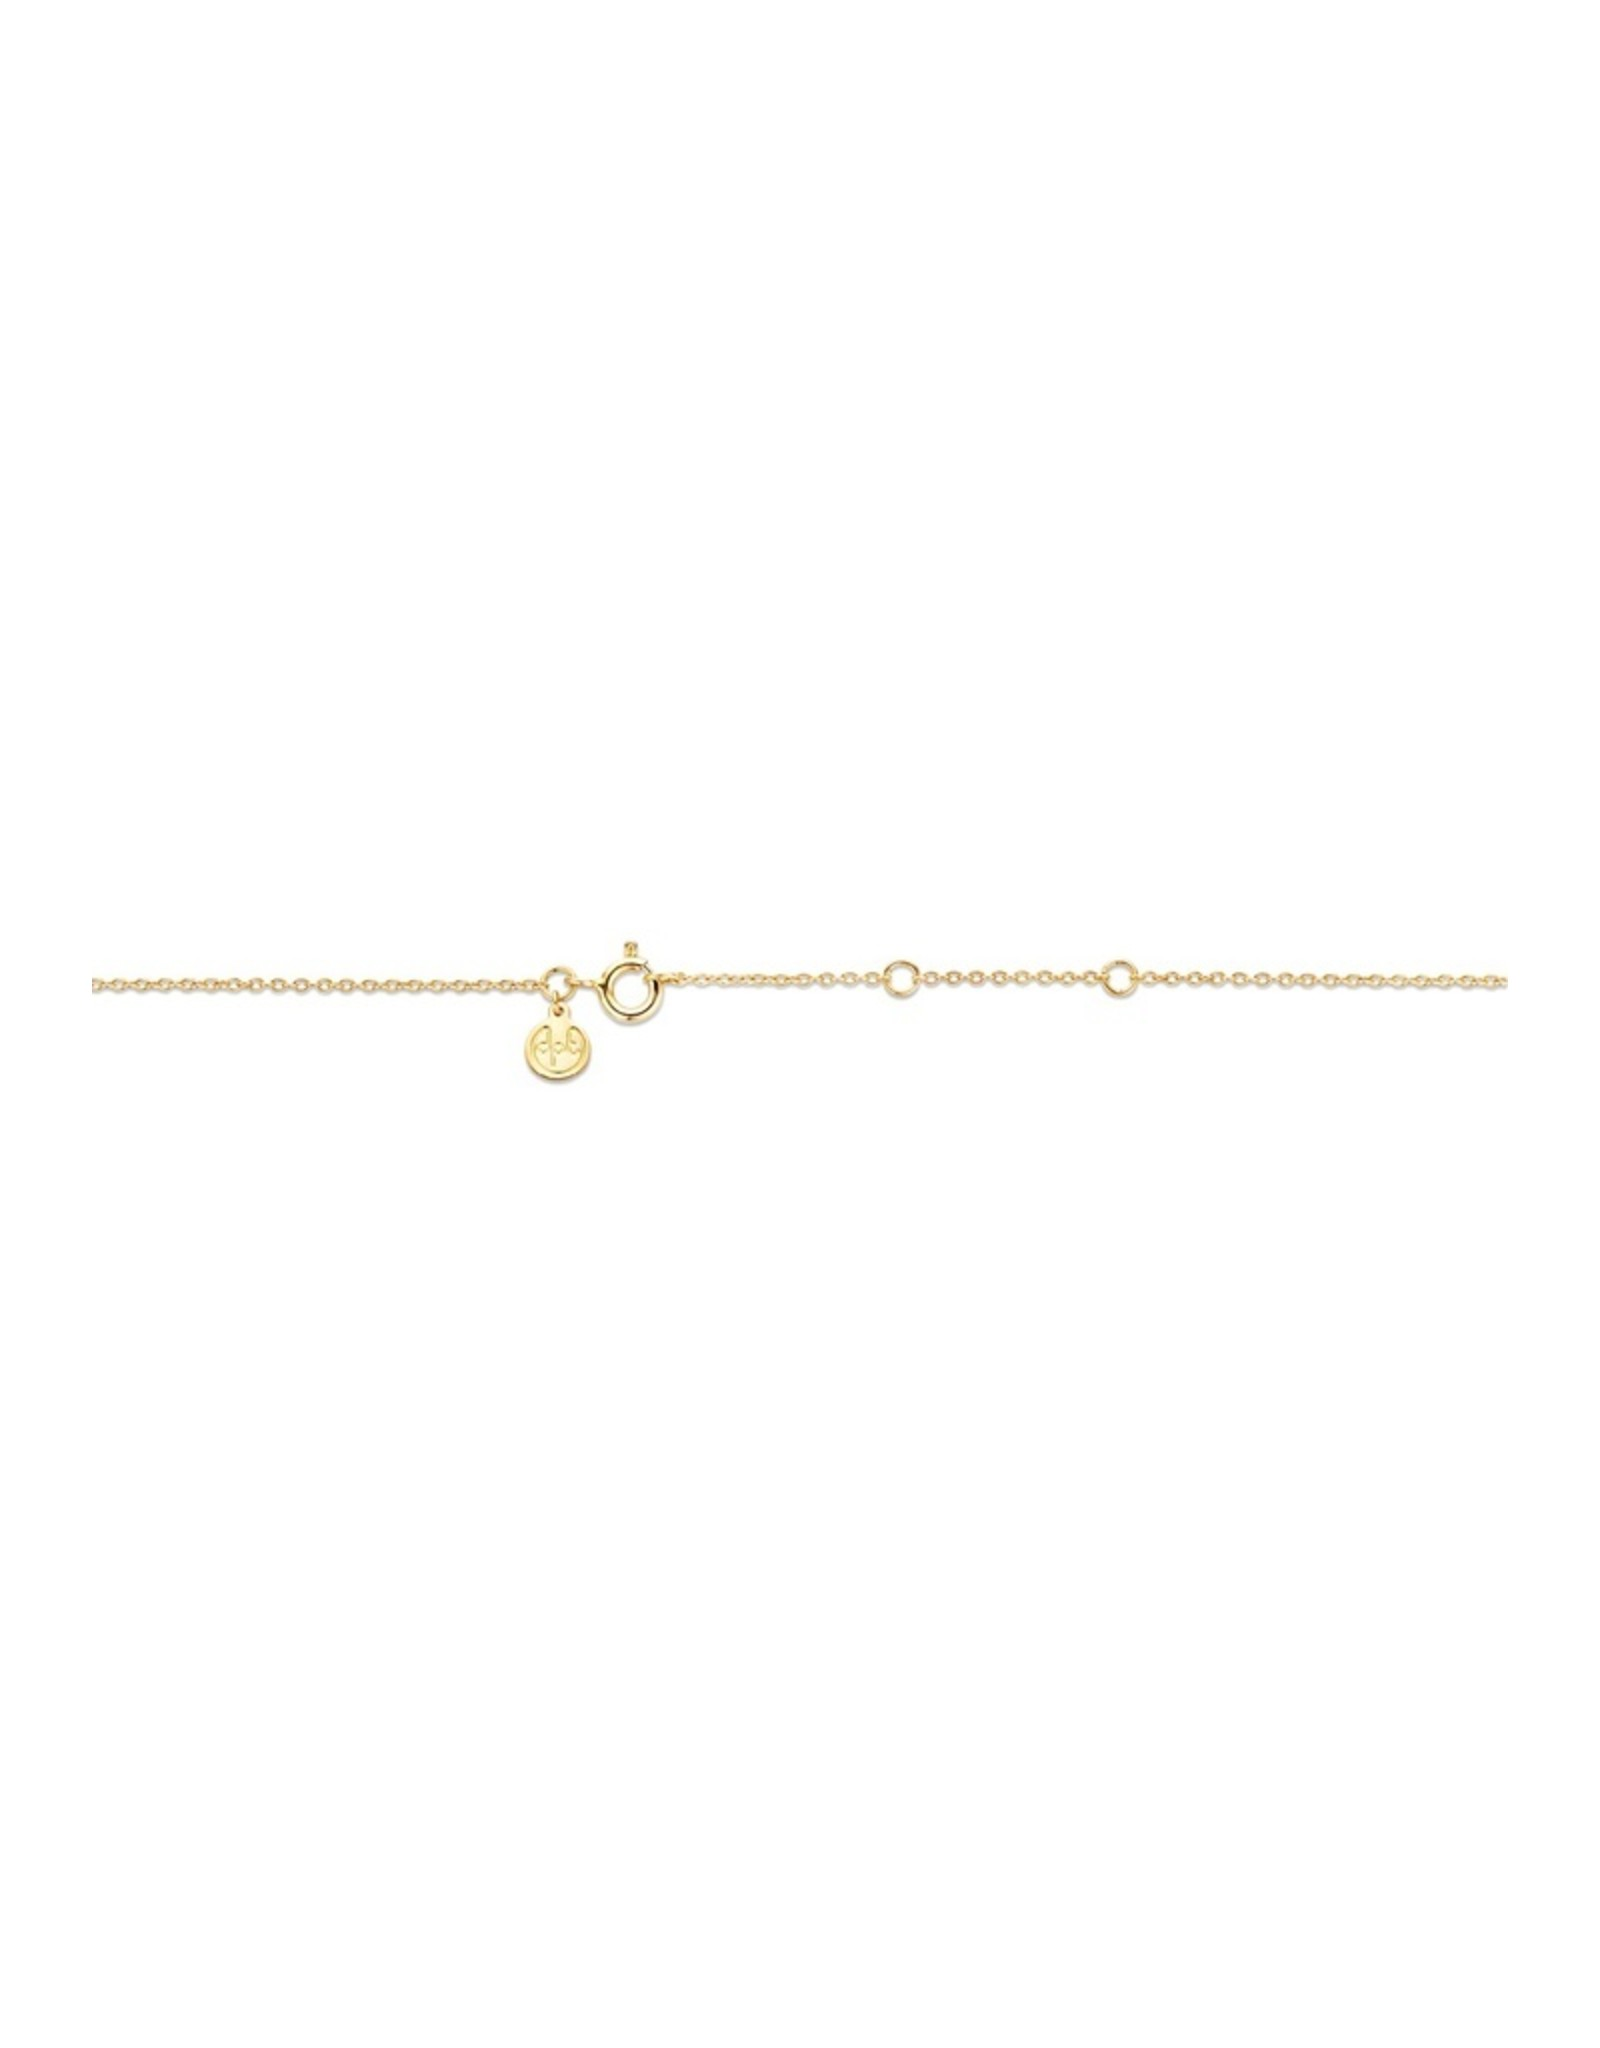 Diamanti Per Tutti Dark Secret Necklace Black Onyx - 42-48 cm - Zilver Goudkleurig Briljant